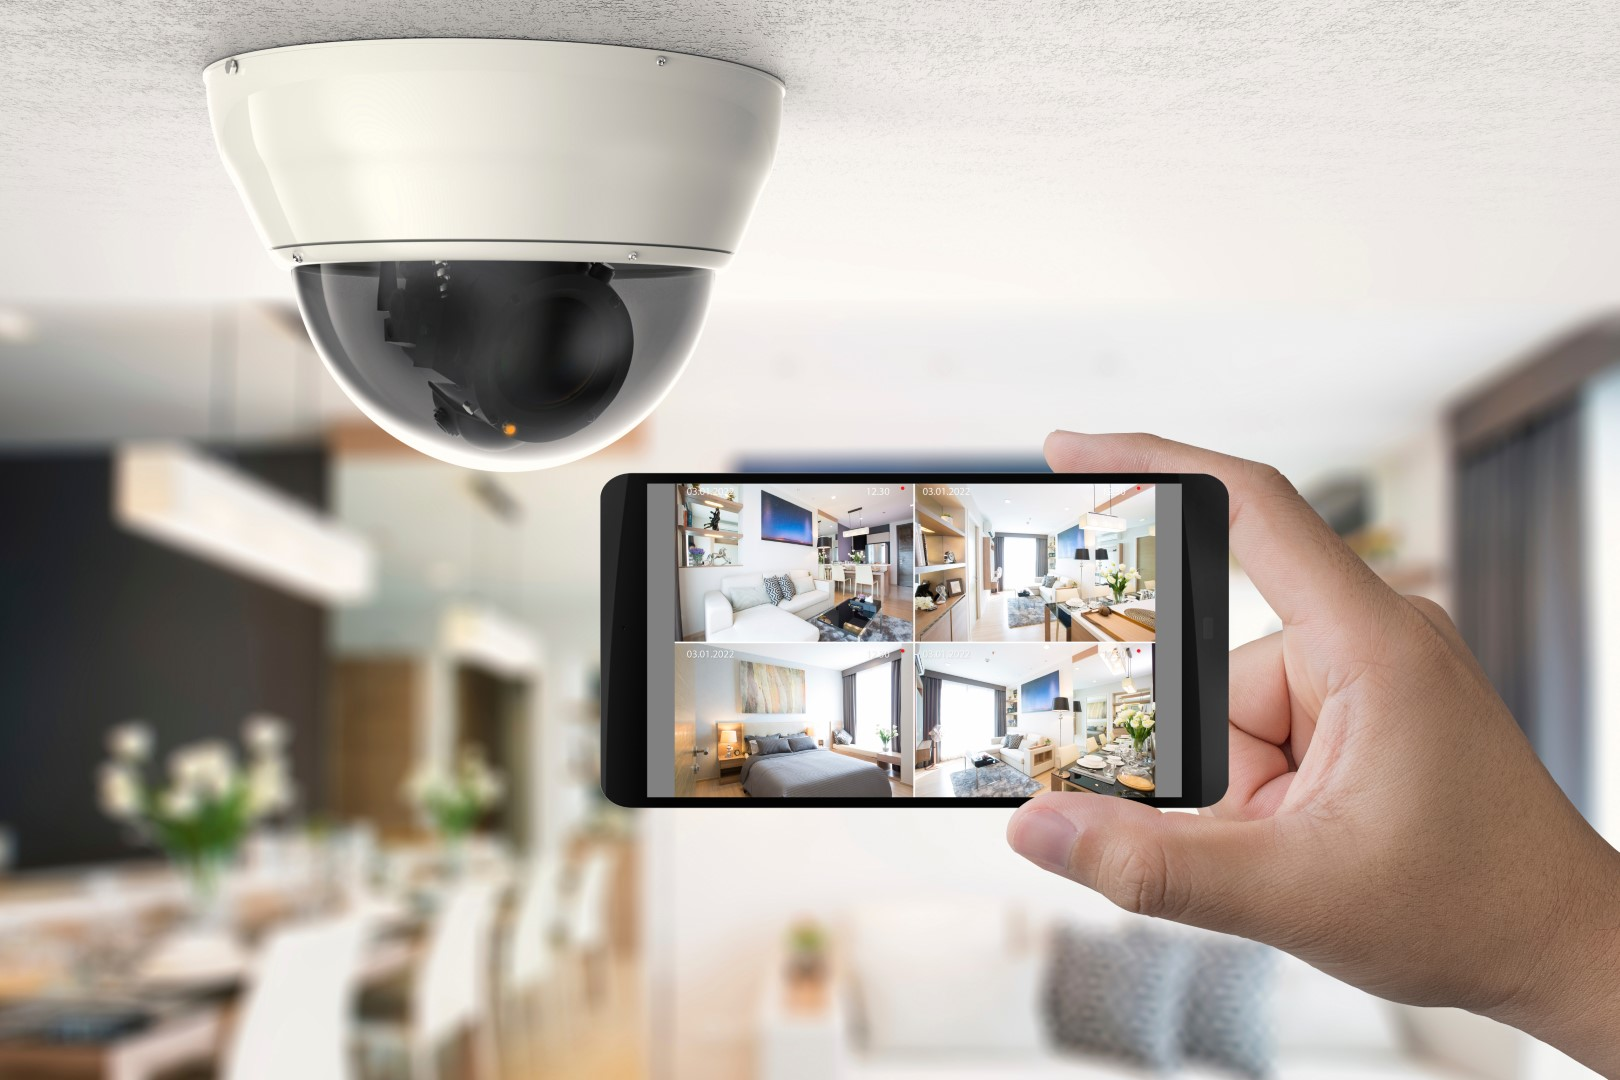 Professionelle IP-Kamera mit Mobile App